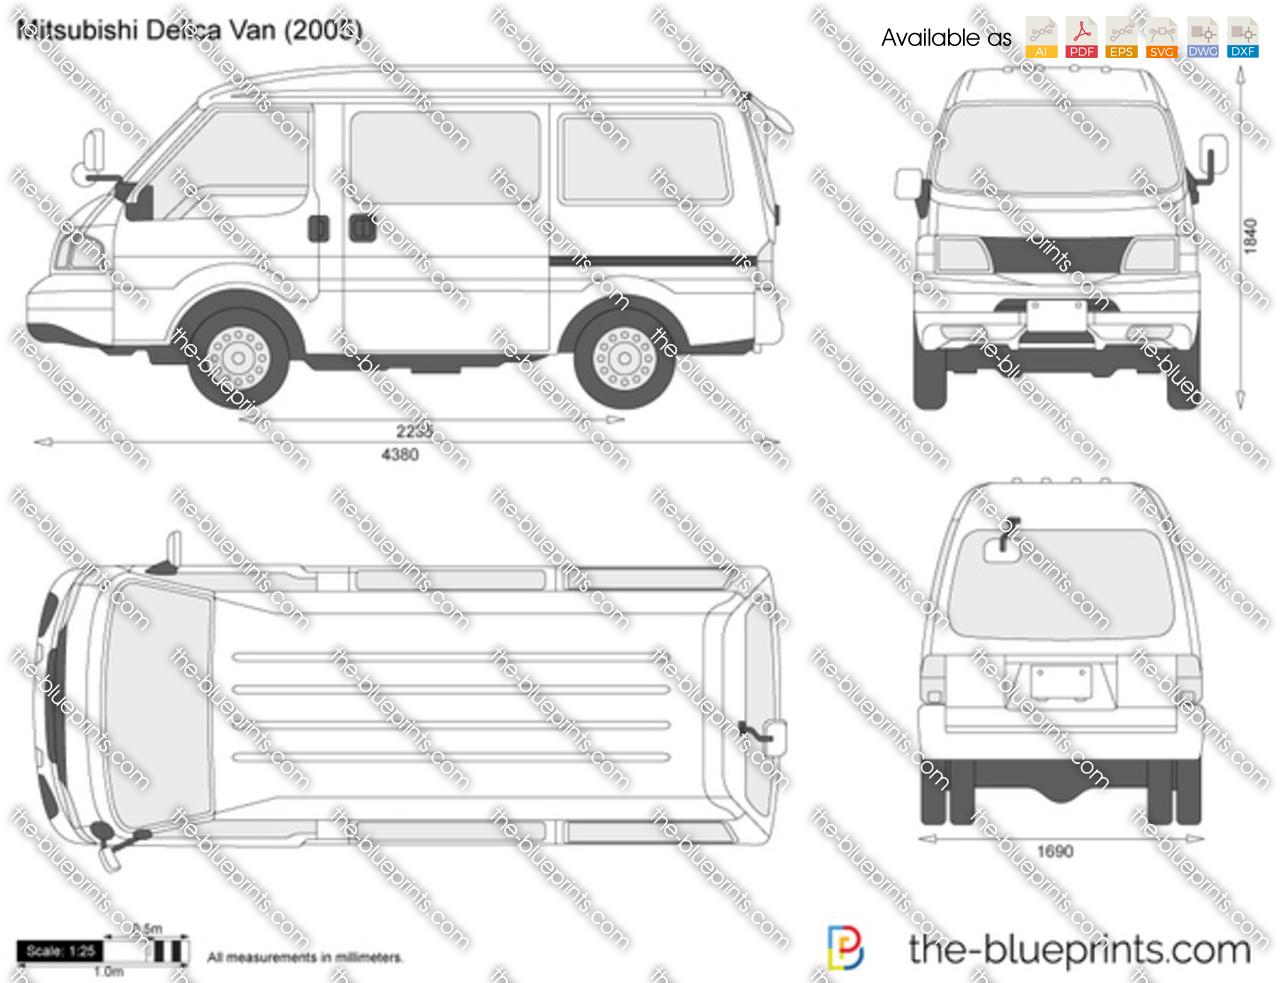 Mitsubishi Delica Van 2006